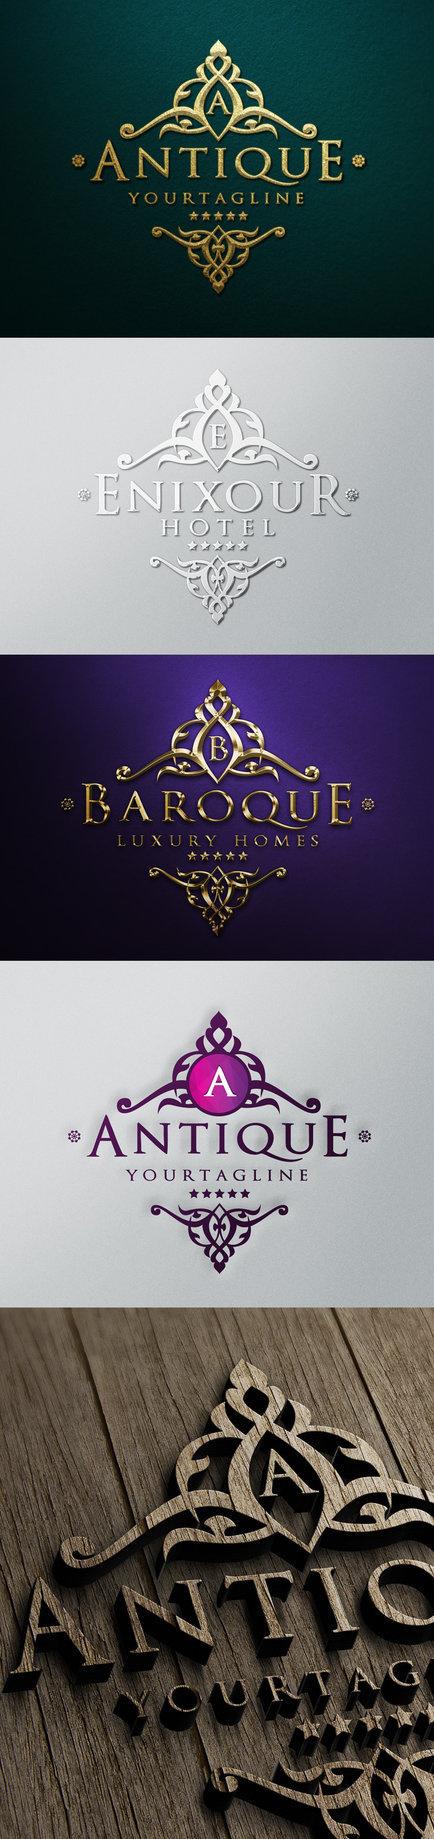 Antique Luxury Logo #template #silver #jewellery #gold #hotel #logo #antique #luxury